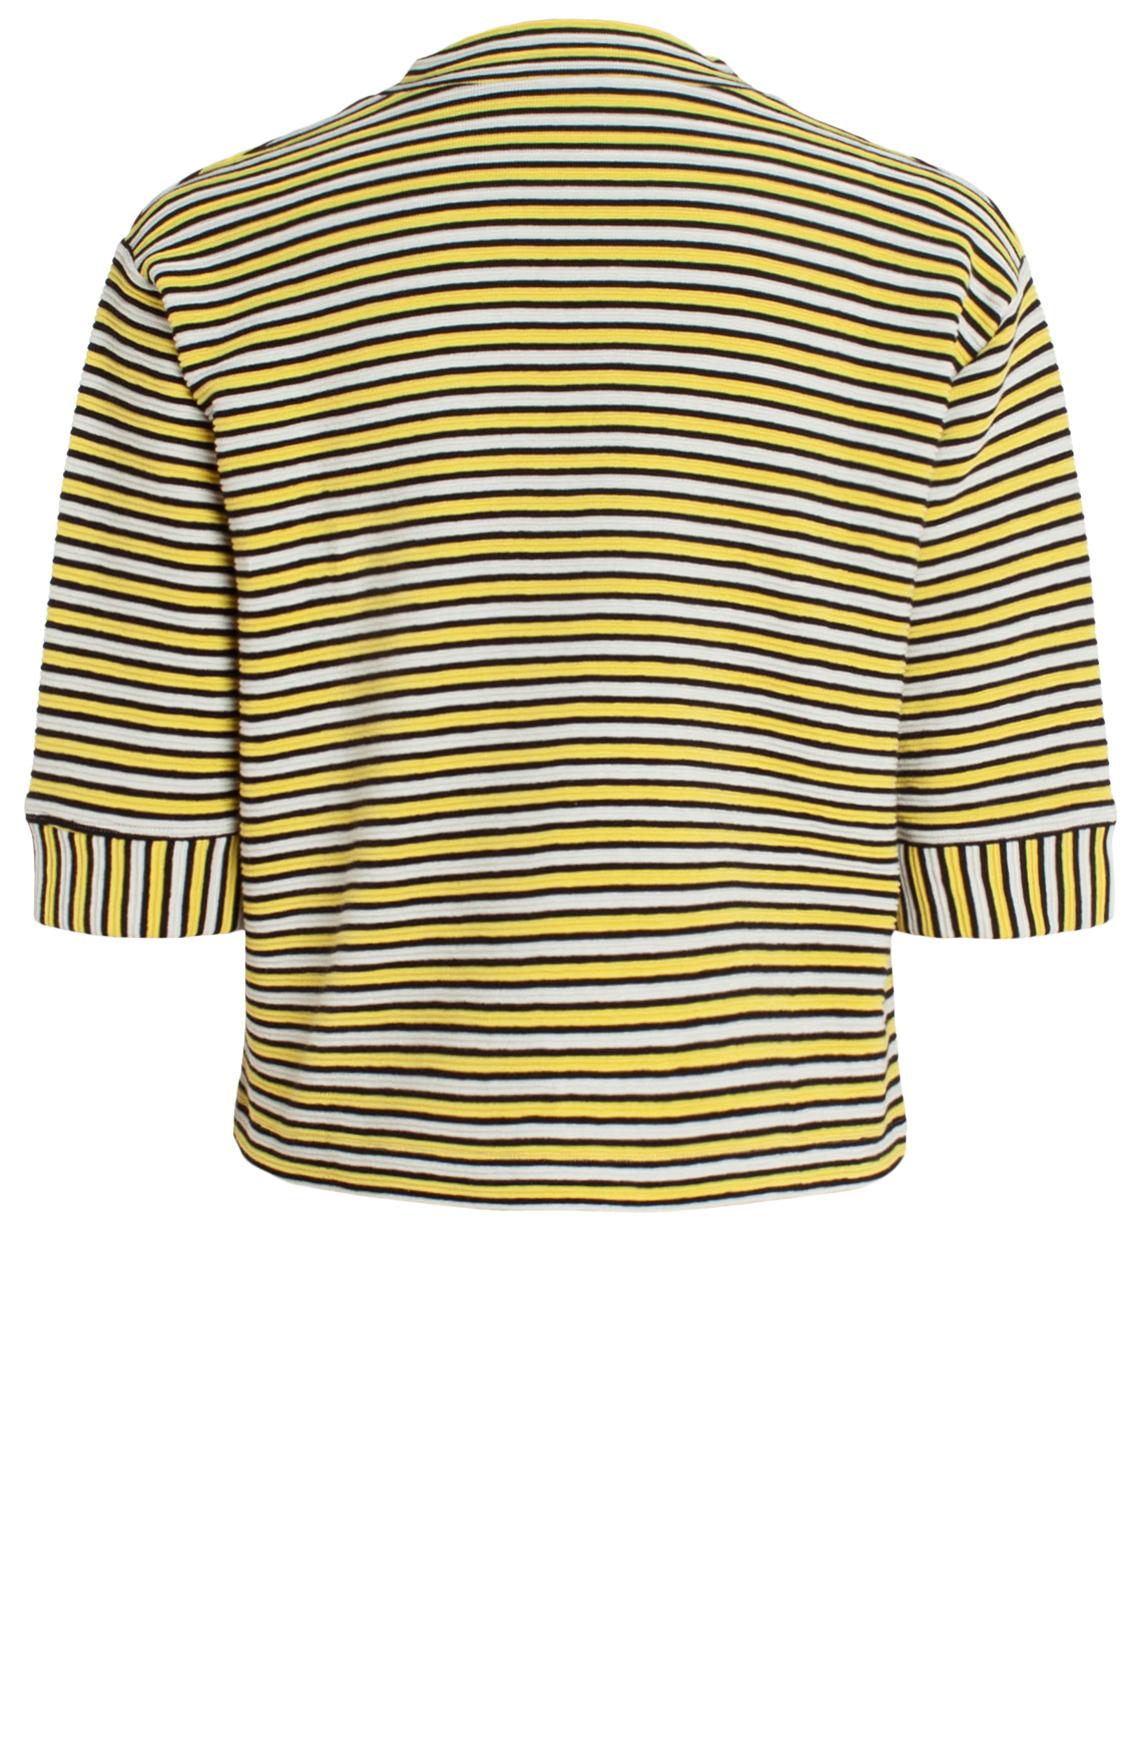 Anna Dames Gestreepte sweater geel